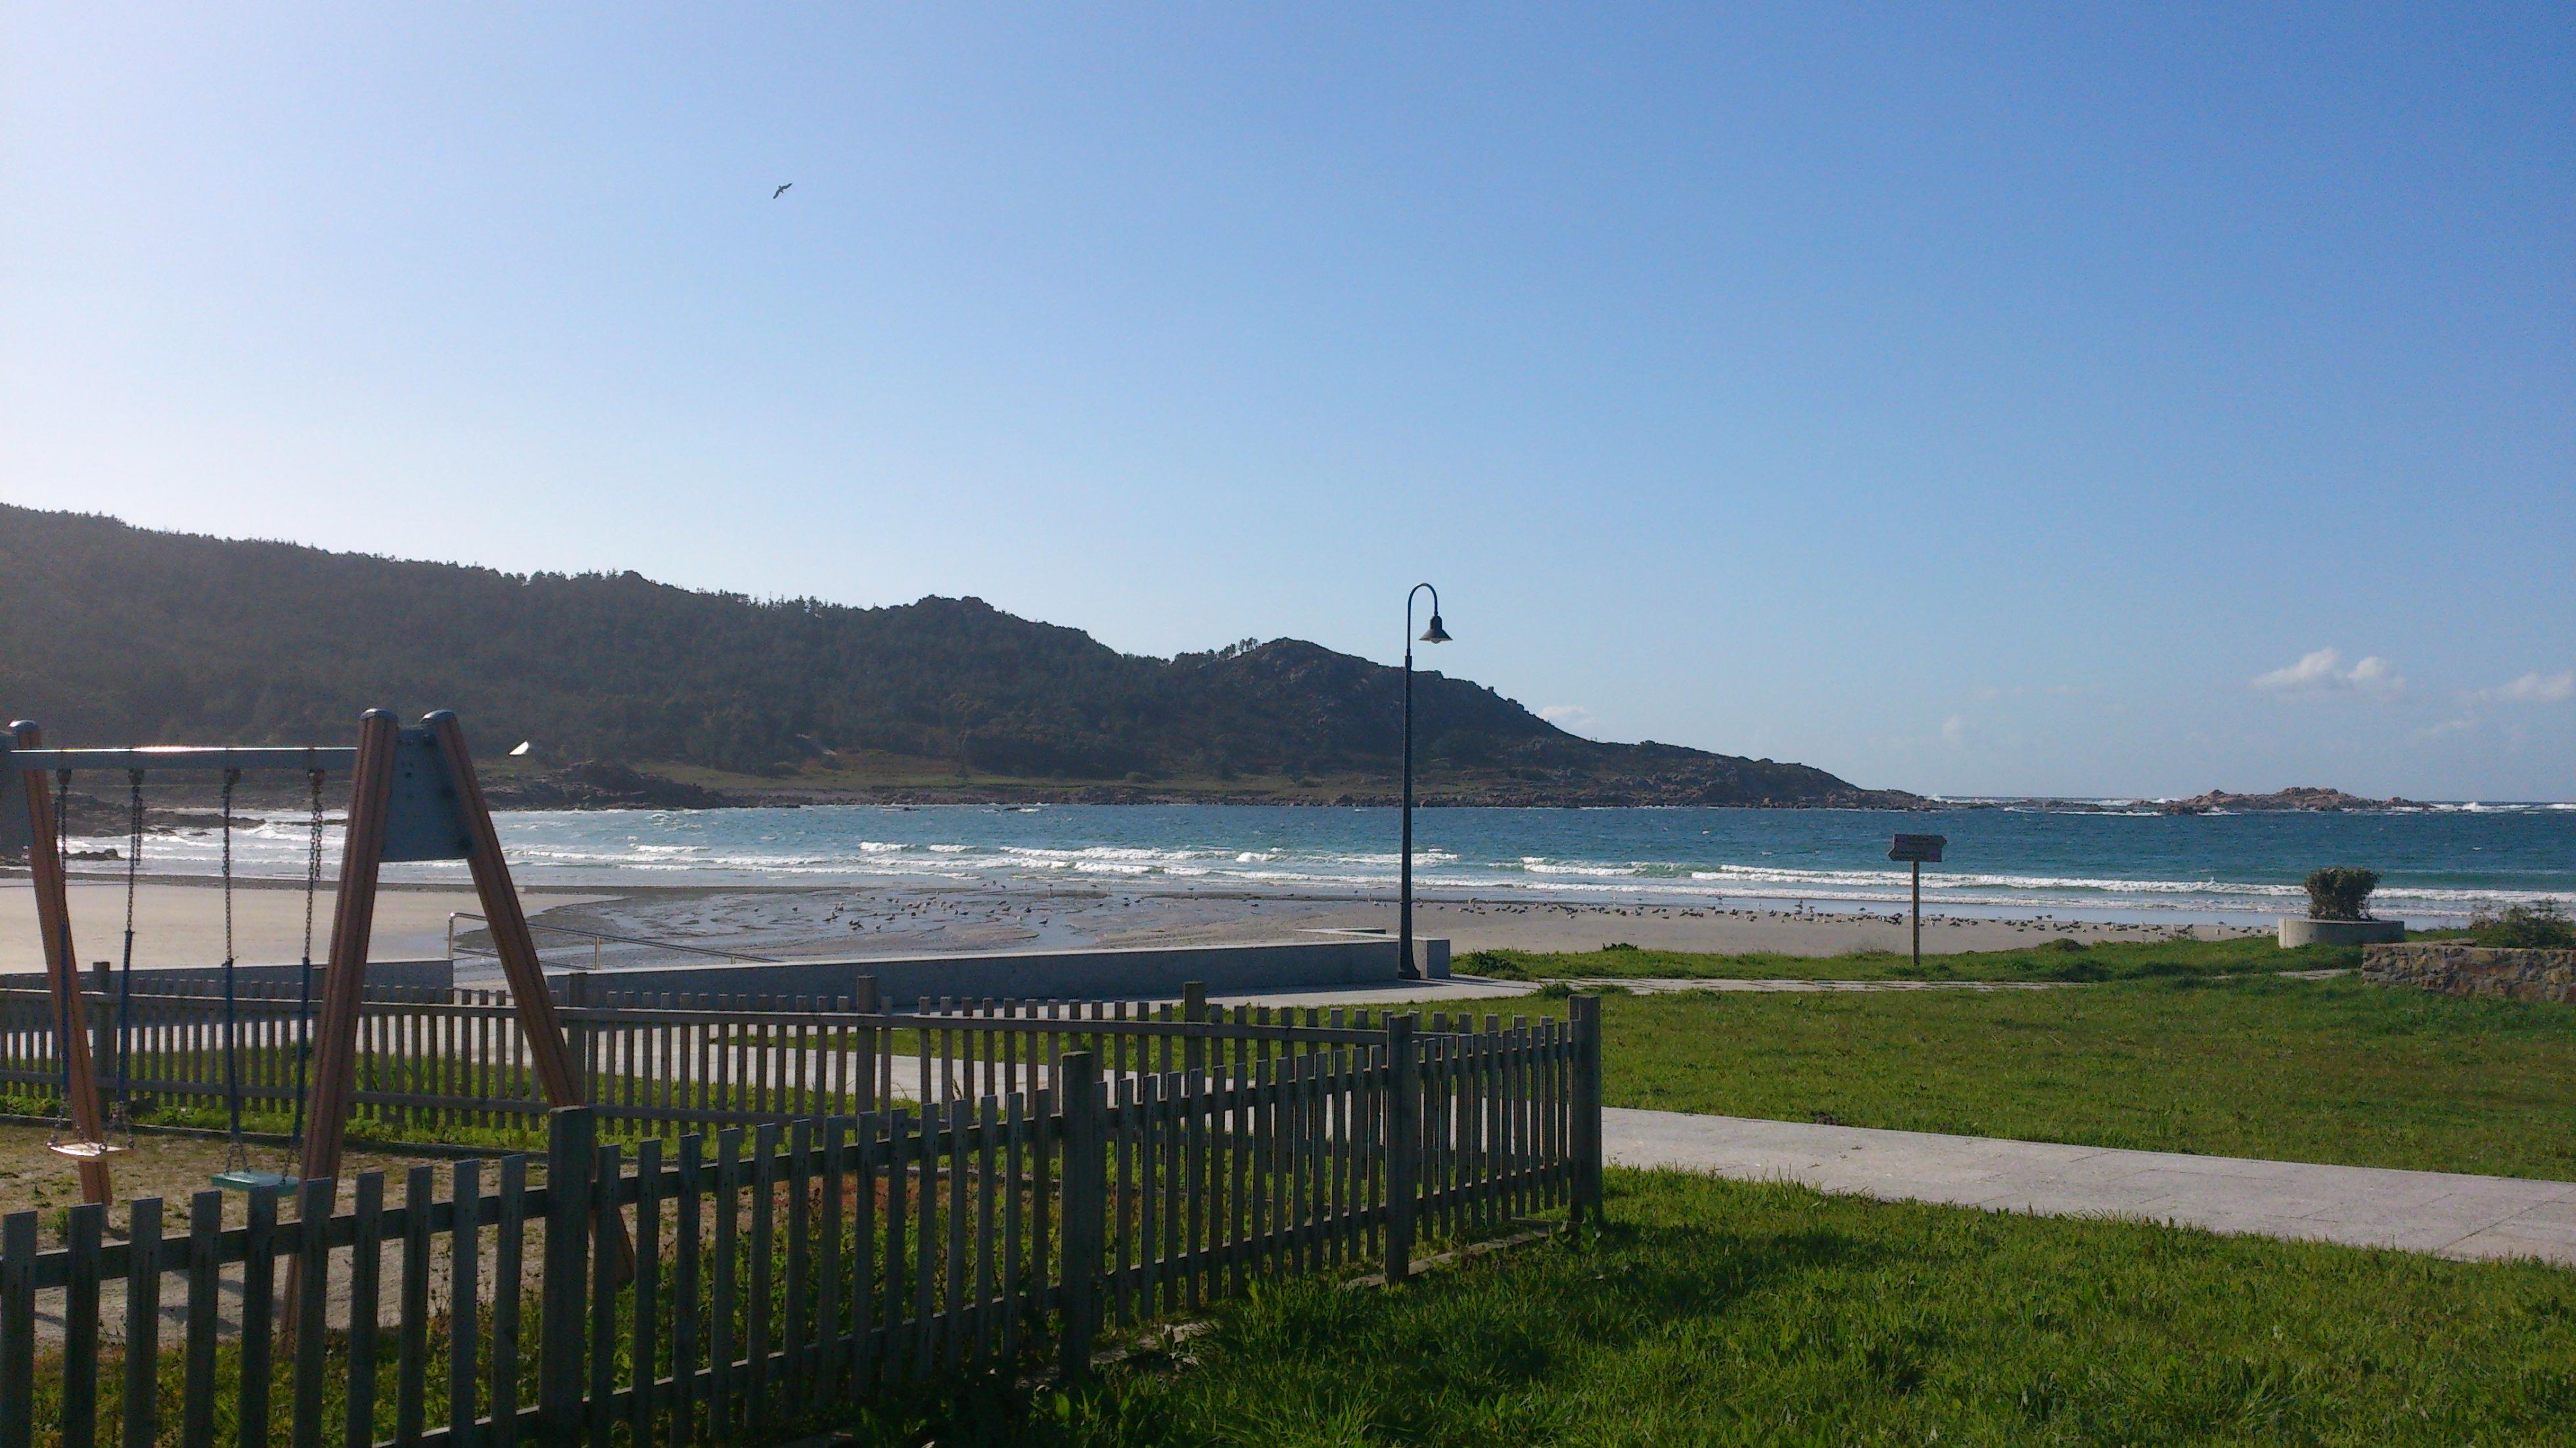 playa y parque infantil